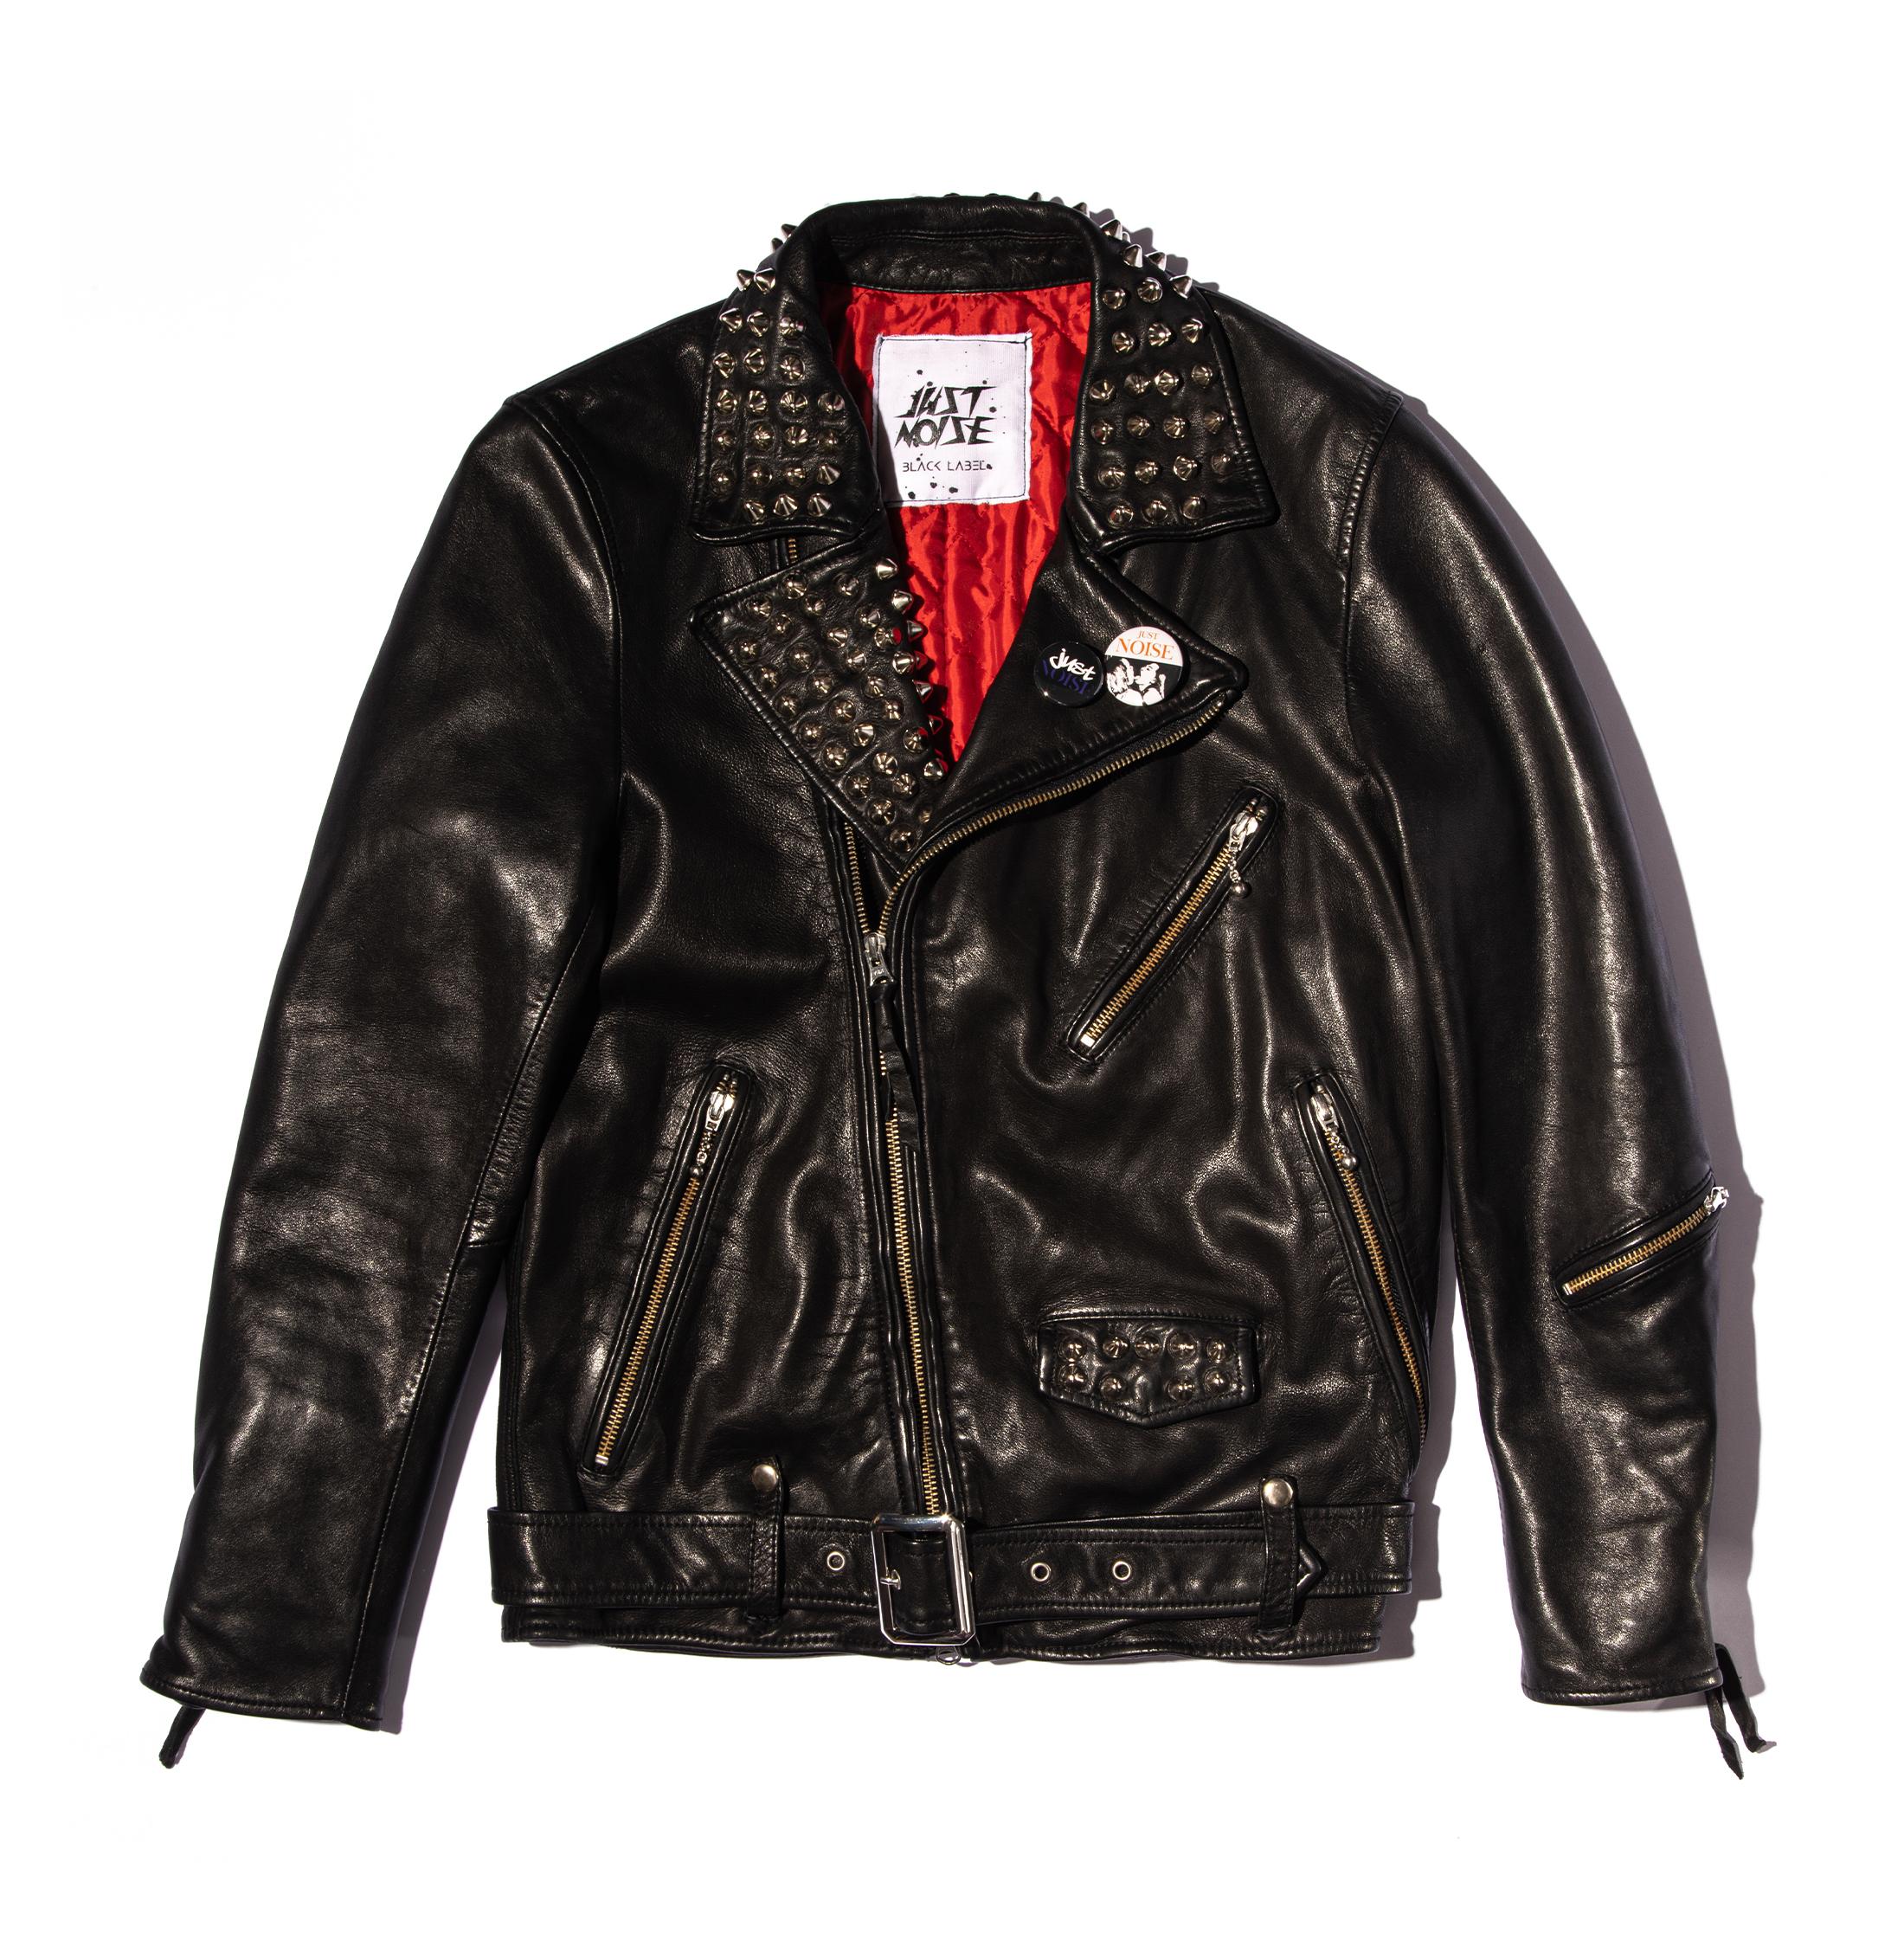 JUST NOISE BLACK LABEL: Leather Jacket-001